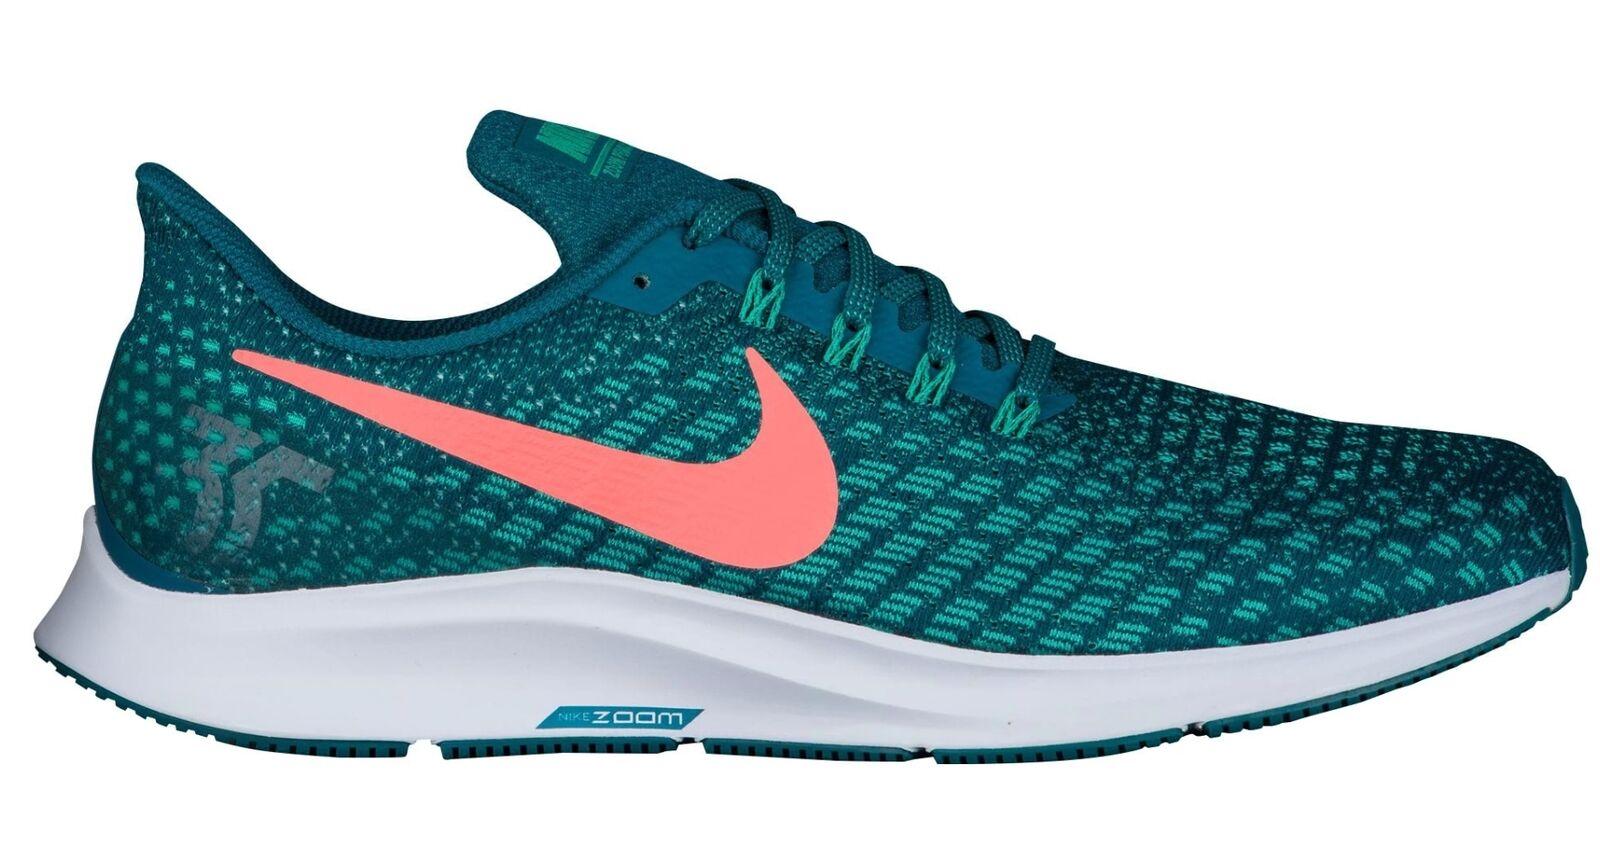 Nike Air Zoom Pegasus 35 Mens 942851-300 Geode Teal Mesh Running shoes Size 9